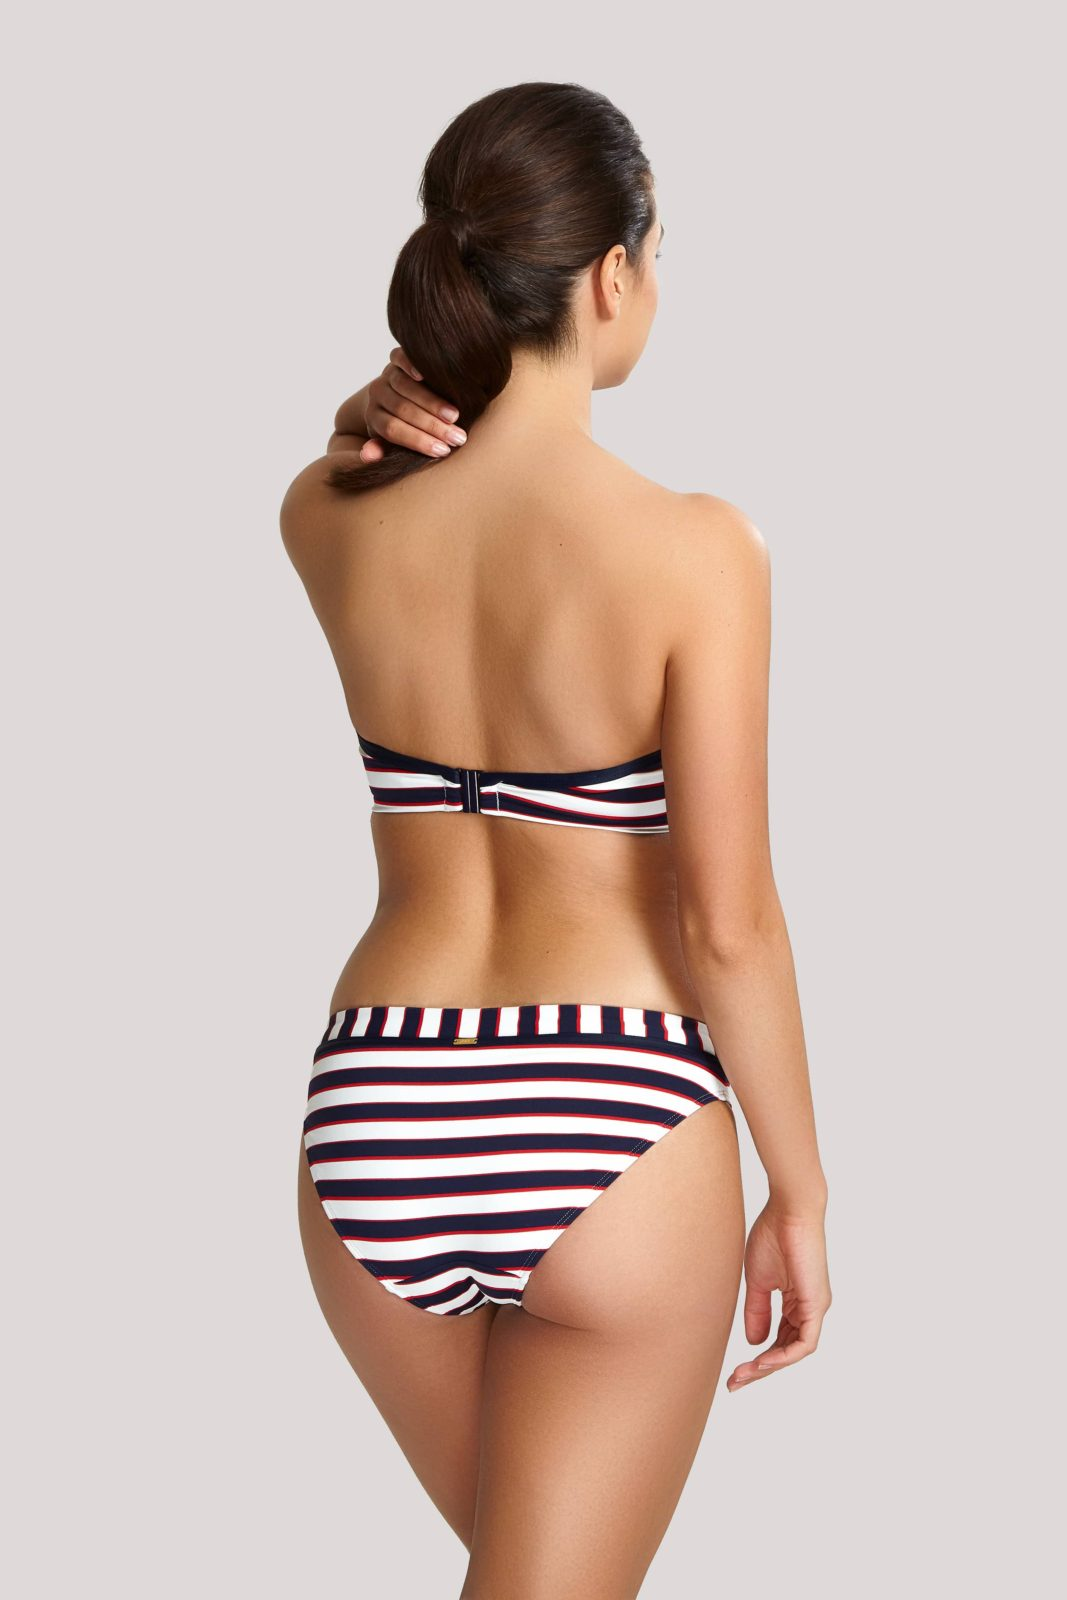 Купальник с формованной чашкой SW1373_622_2 Lucille Bandeau Bikini Navy Stripe T F 2-min